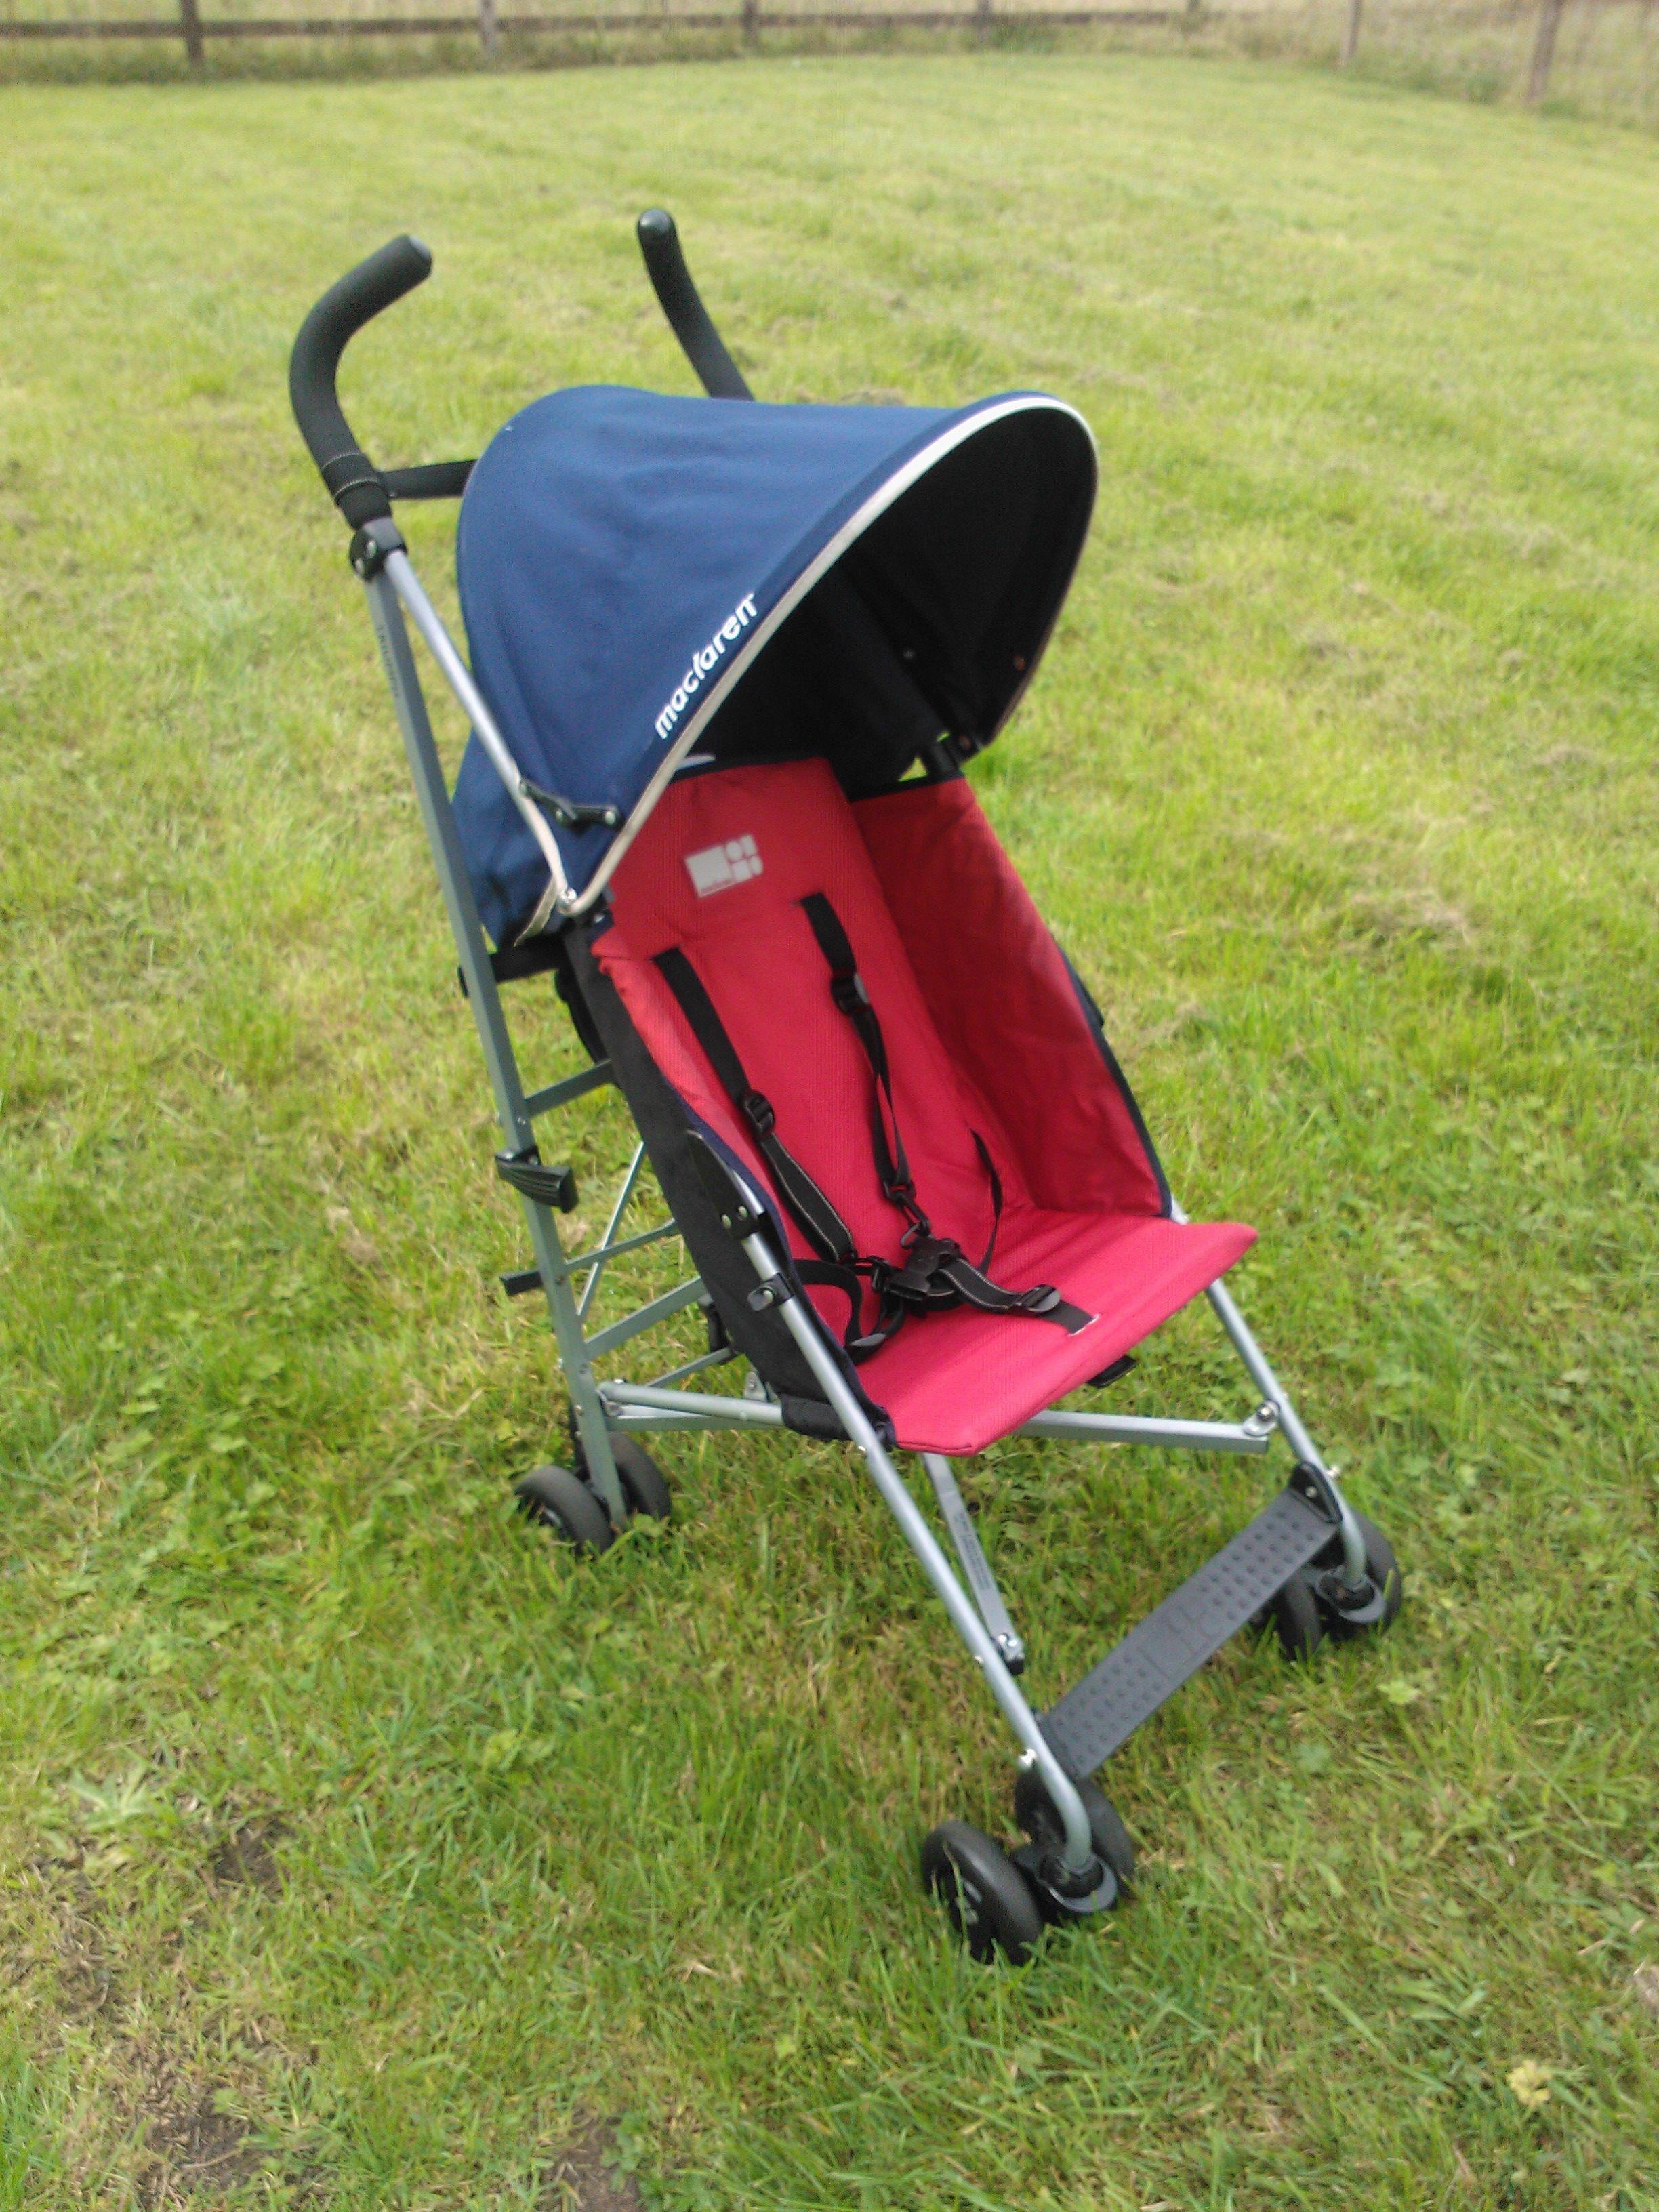 Maclaren Triumph Pushchair + rain cover £26 Baby